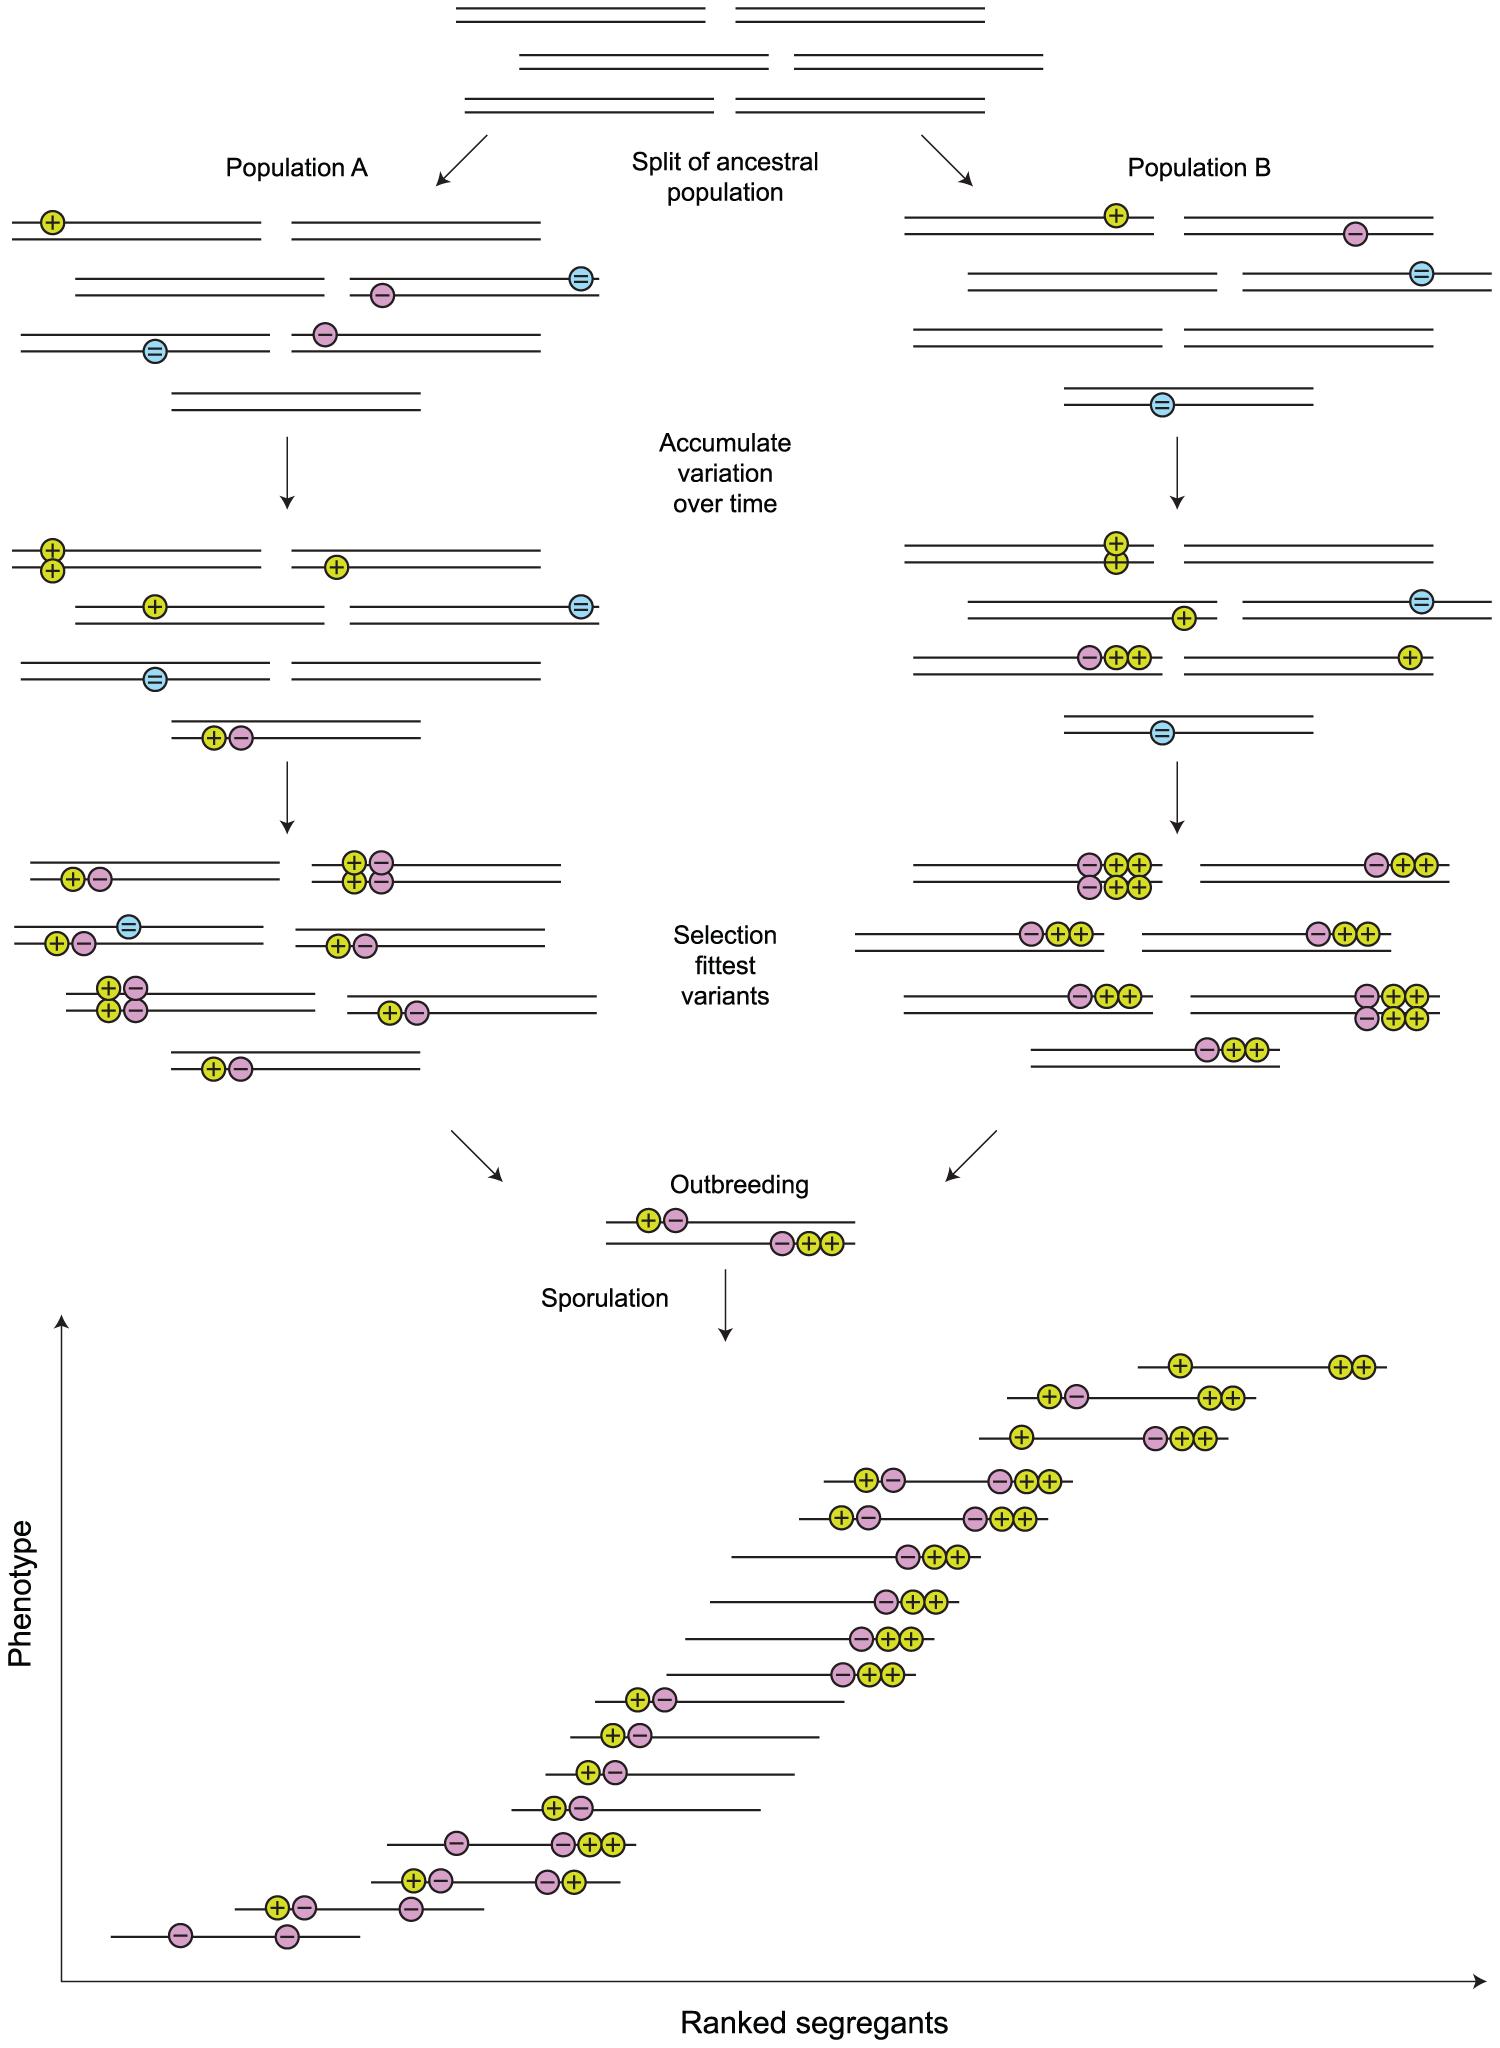 Linked quantitative trait loci (QTLs) can arise through normal population genetic processes.